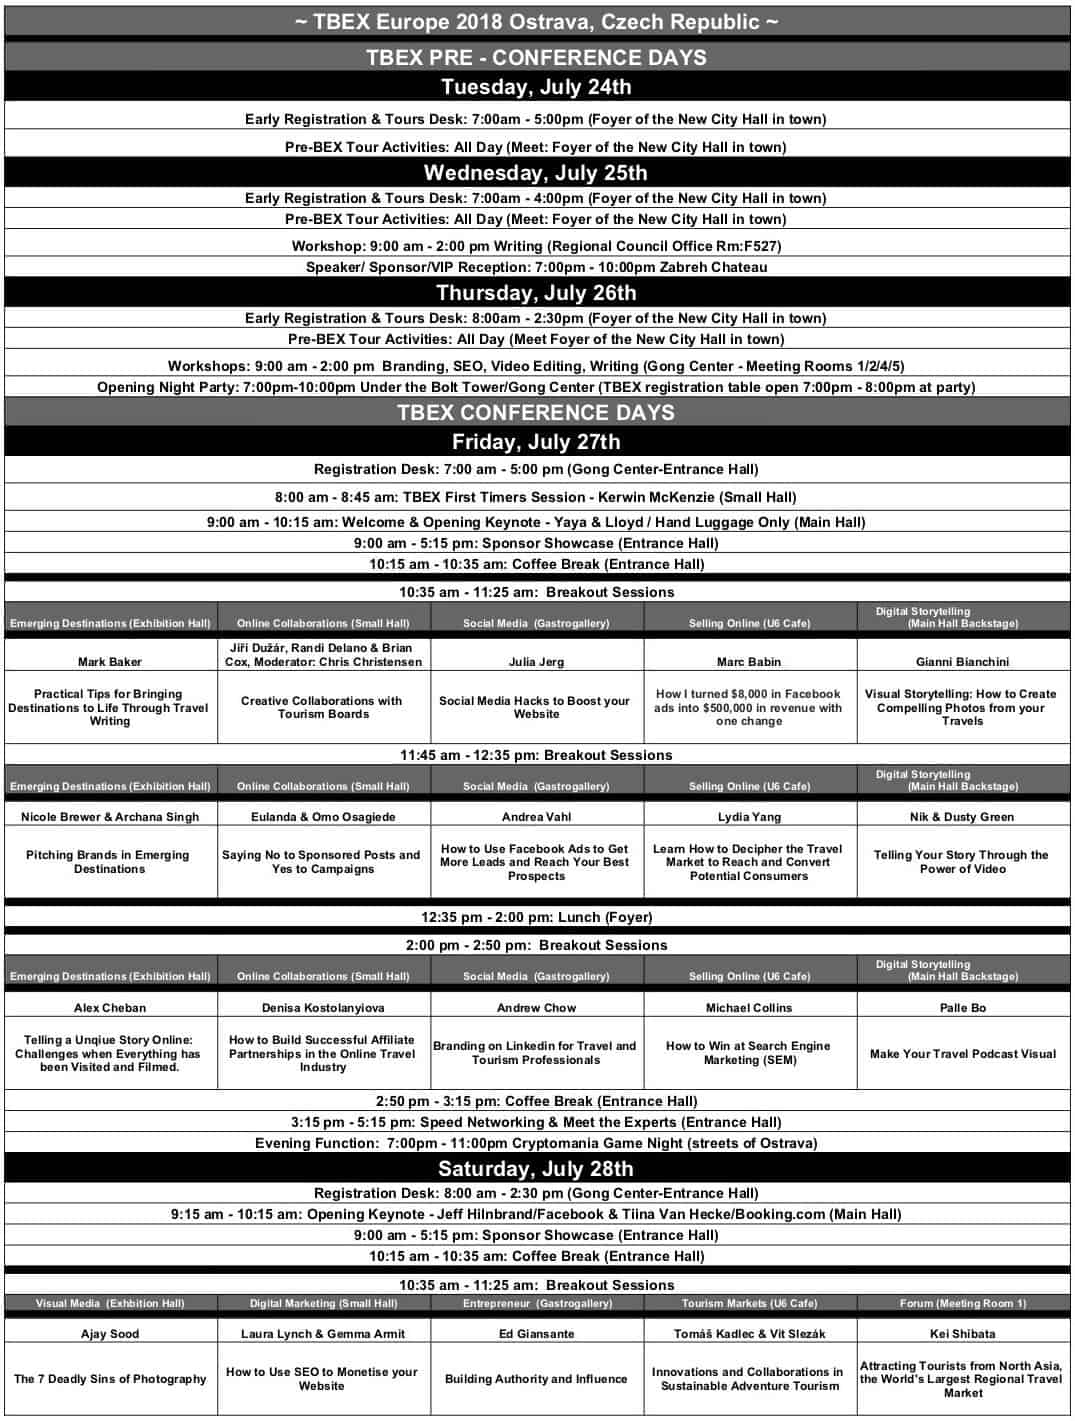 tbex ostrava 2018 calendar schedule part 1